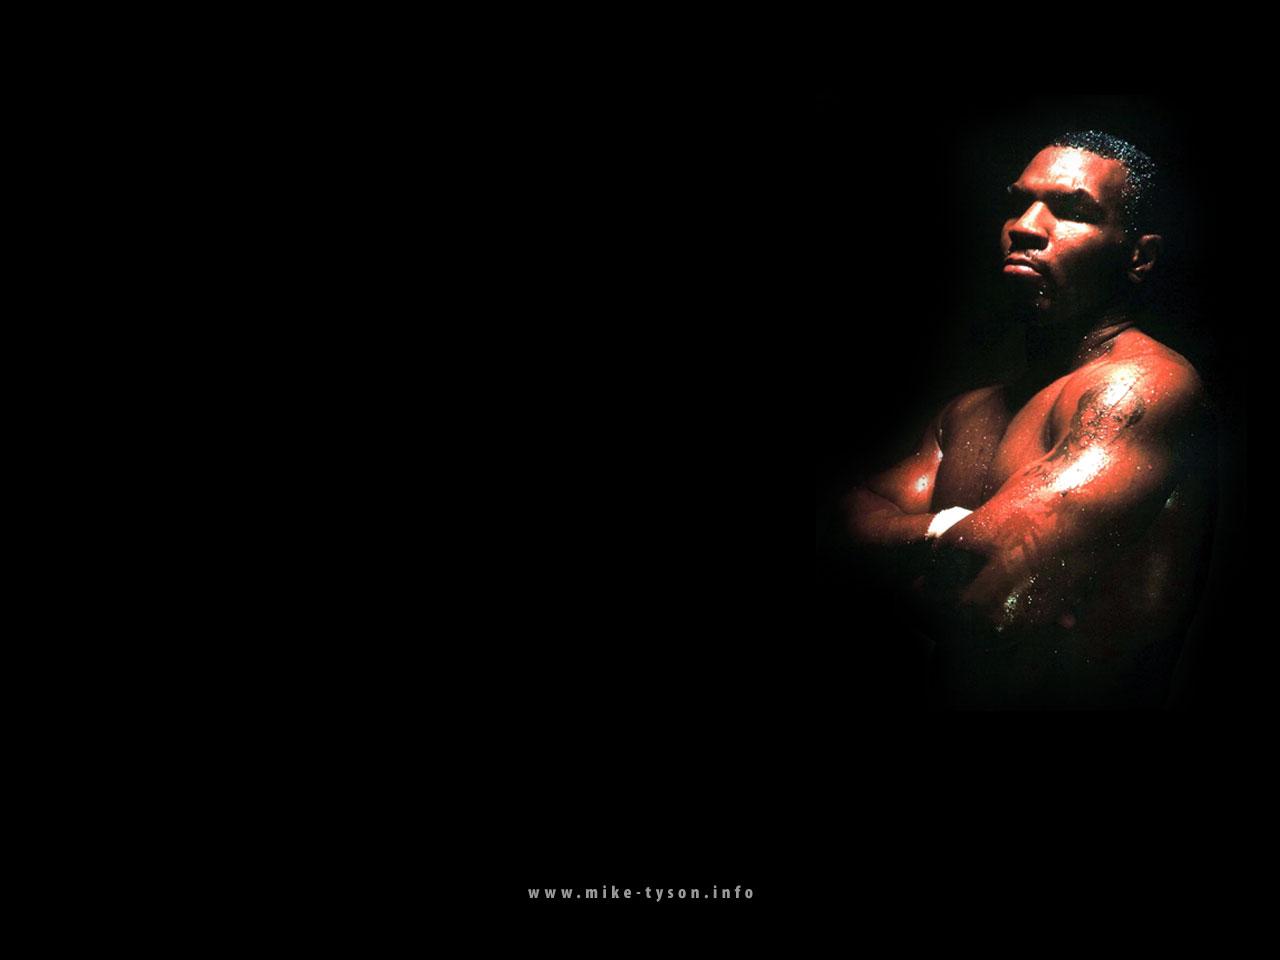 http://2.bp.blogspot.com/-5hAZt7e5orY/T1xnLOkDpII/AAAAAAAABZg/dVEwh9xciJE/s1600/Mike-Tyson-02.jpg